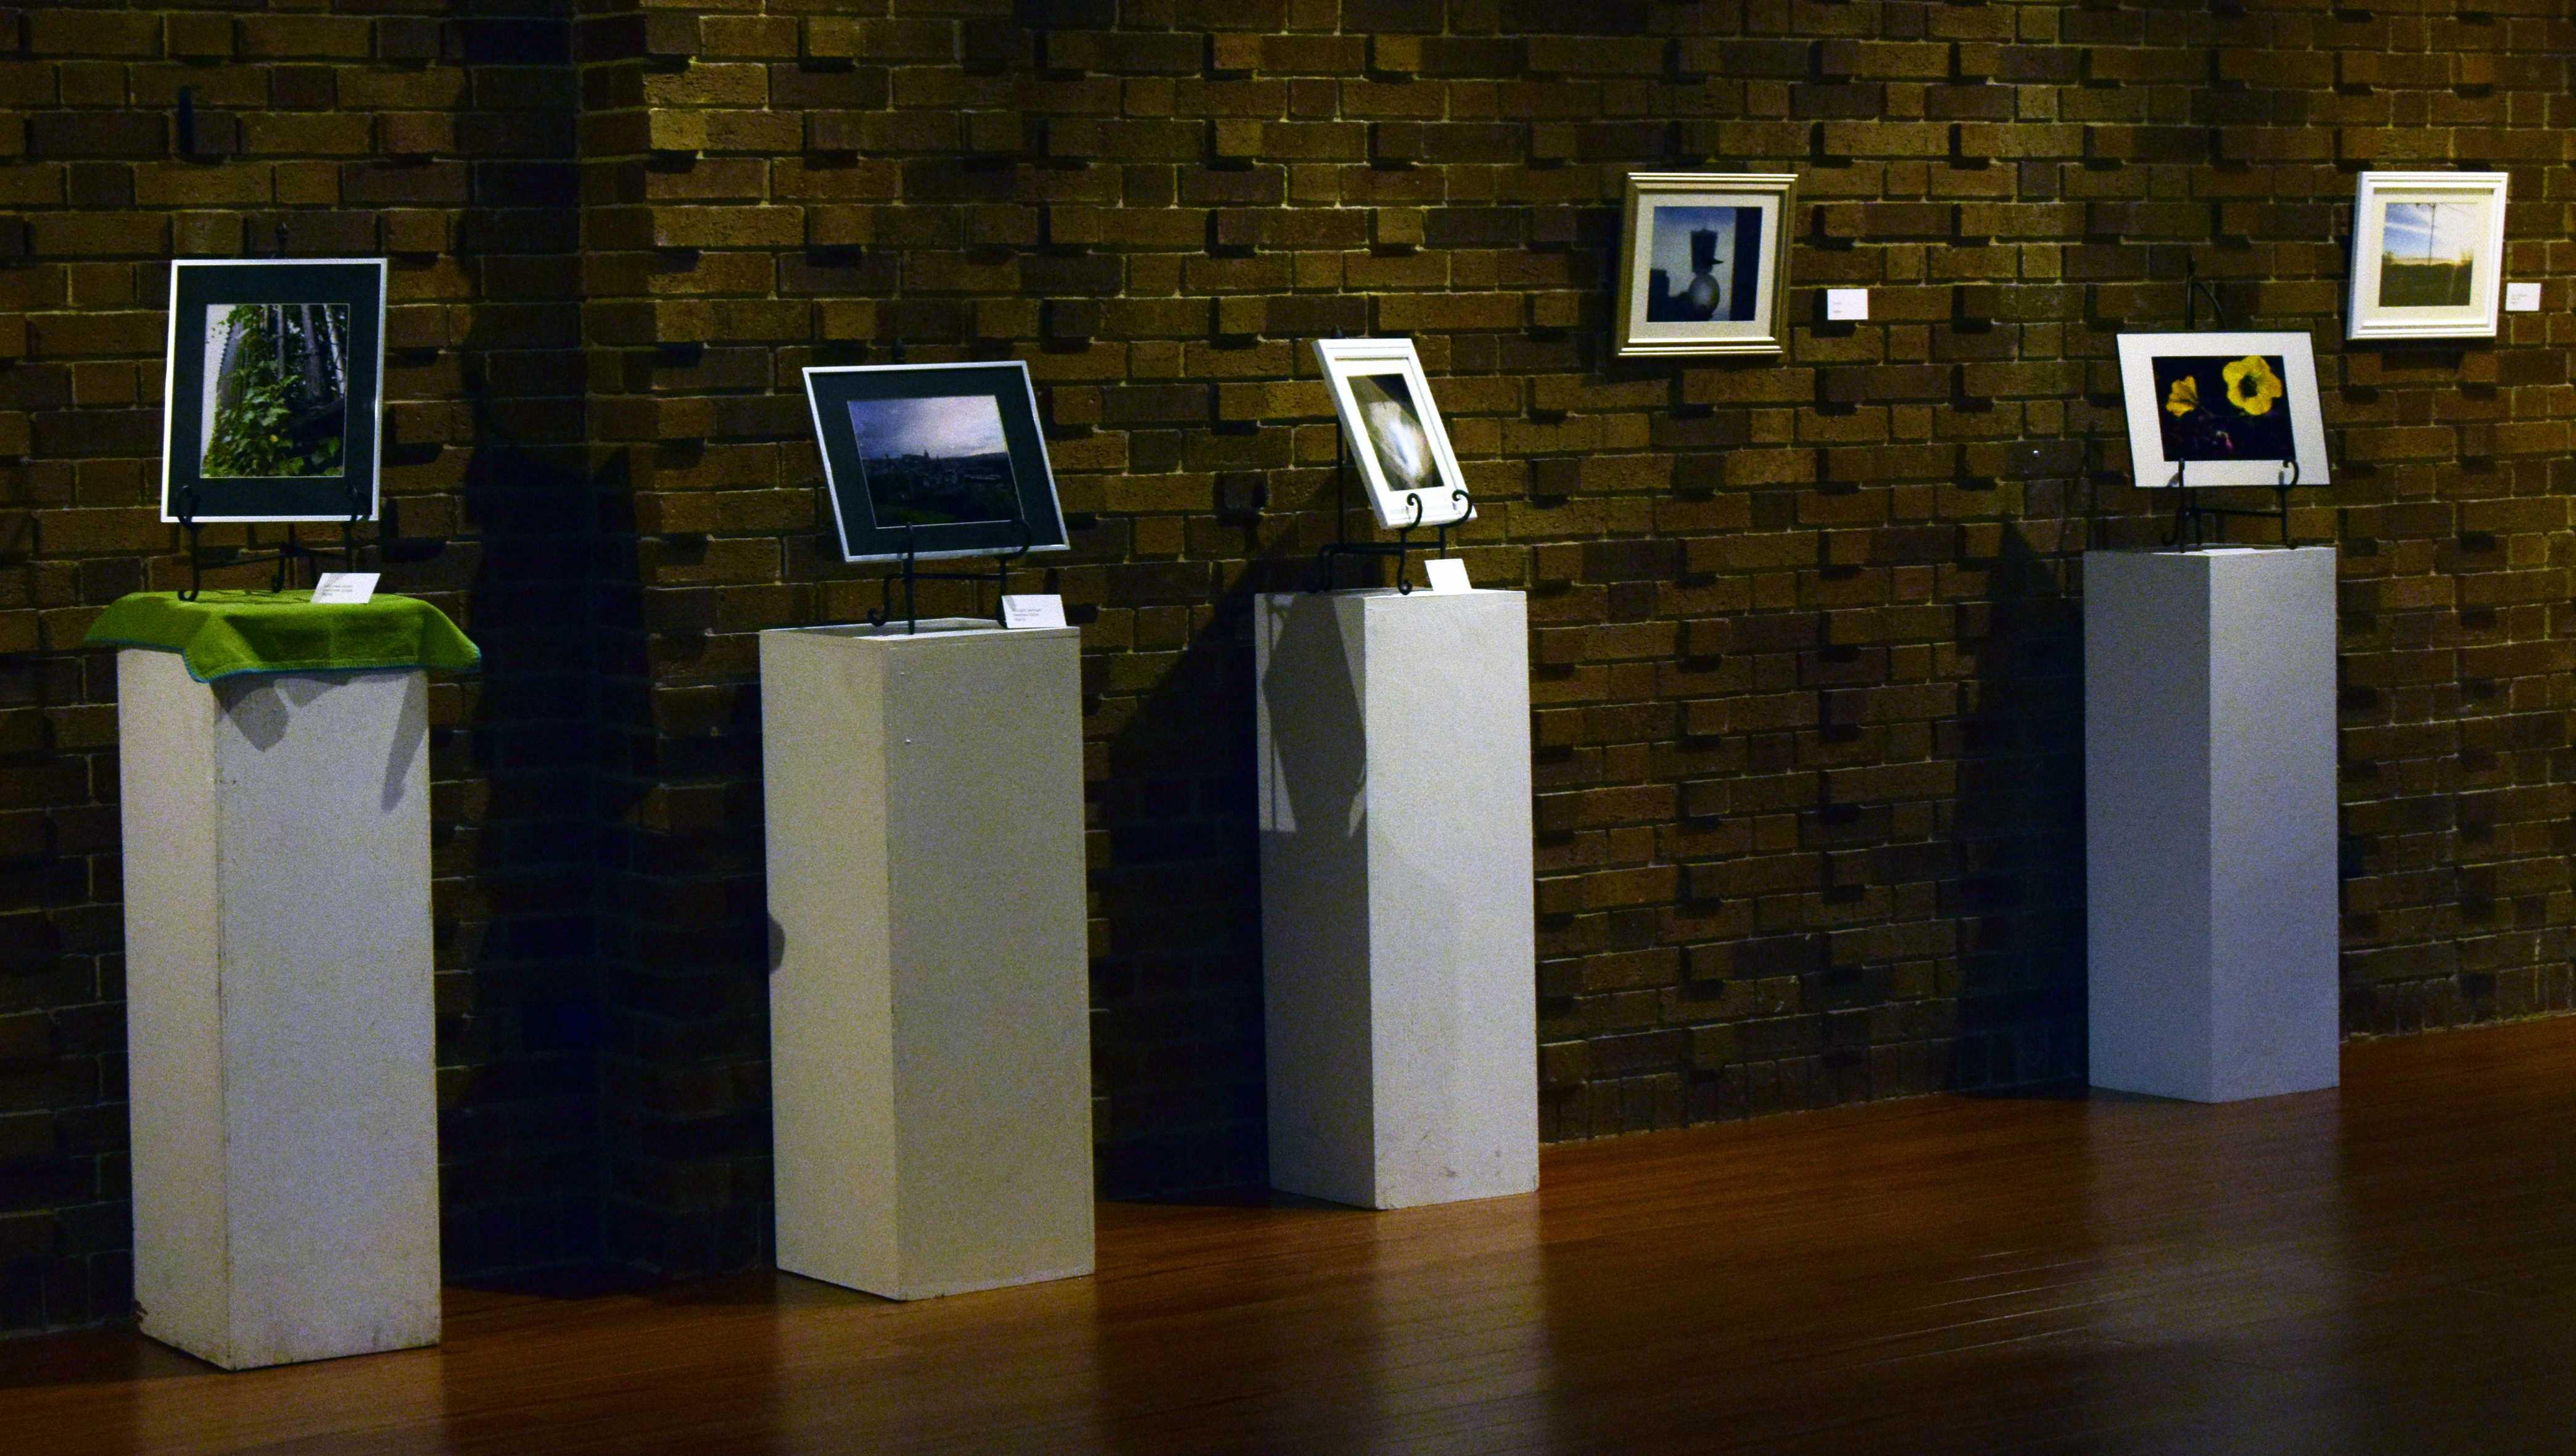 Schuster Gallery displays photos